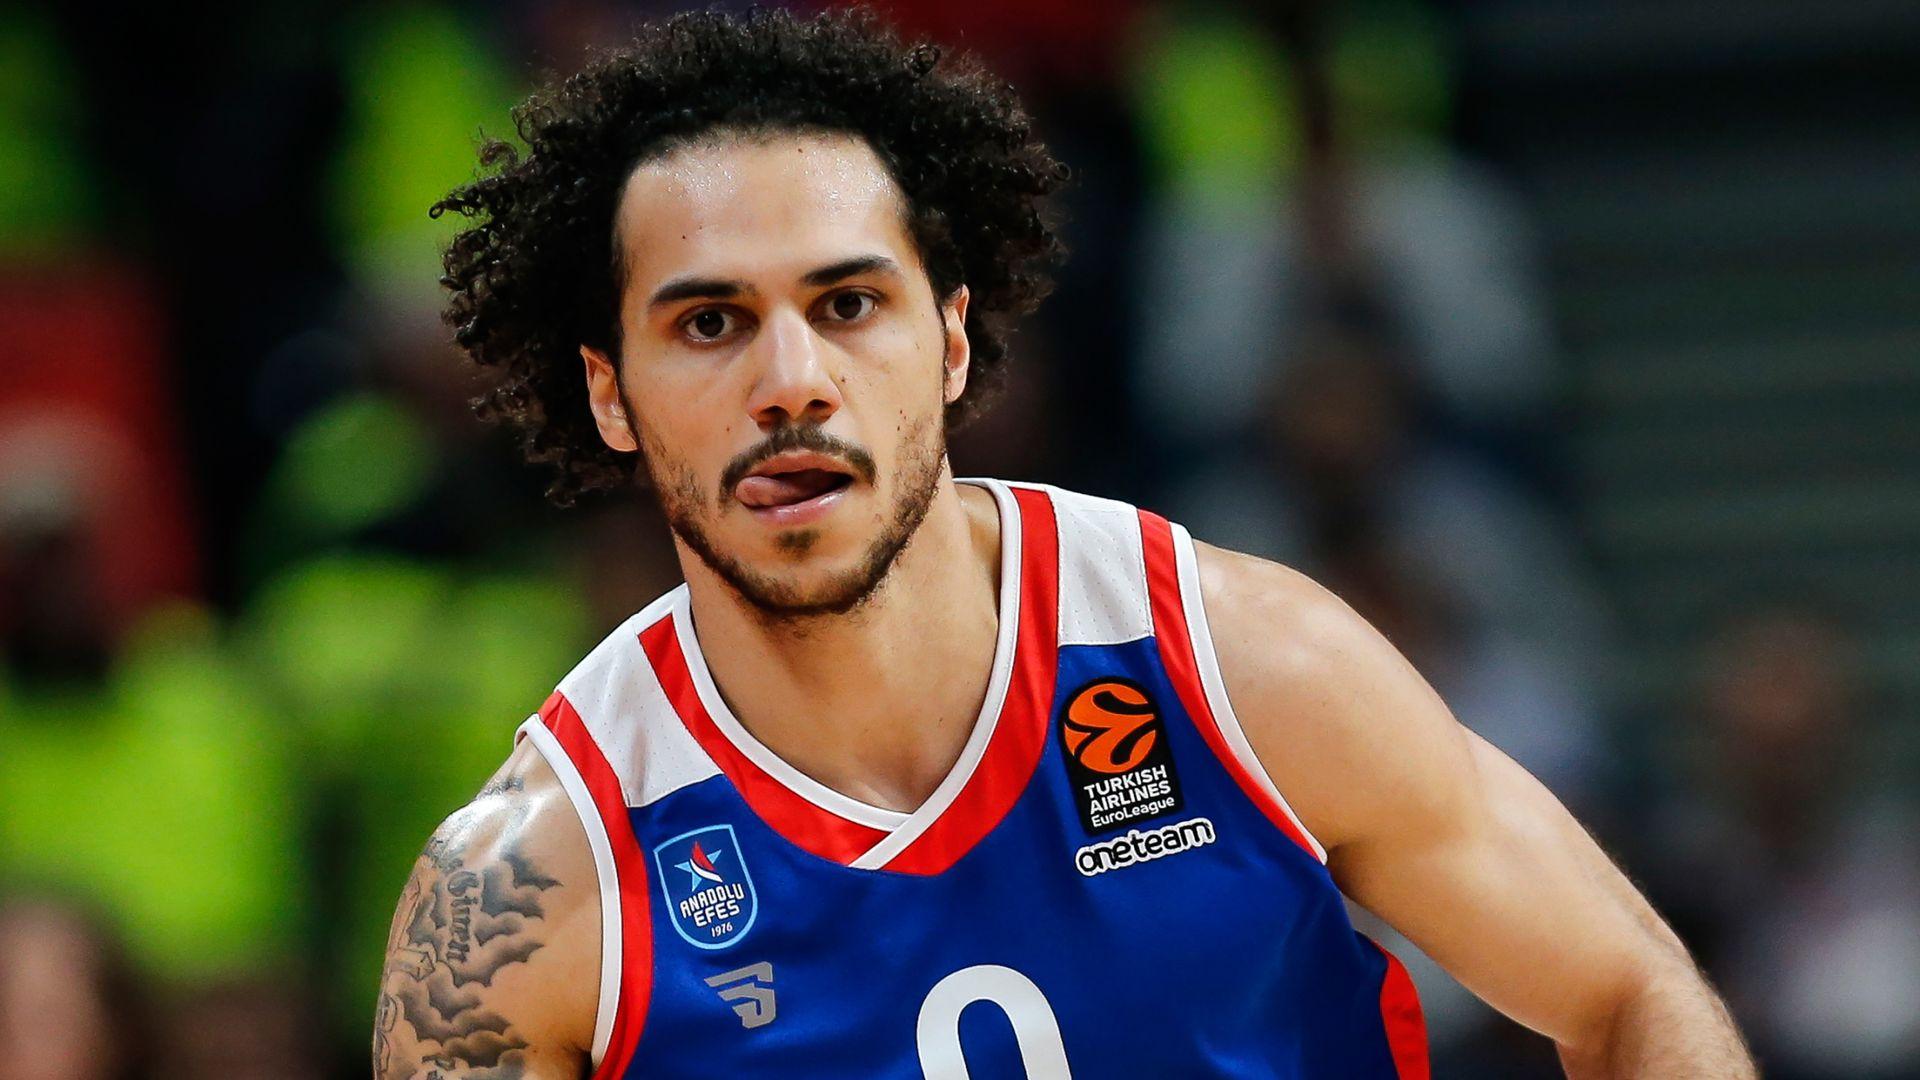 EuroLeague cancels season because of coronavirus